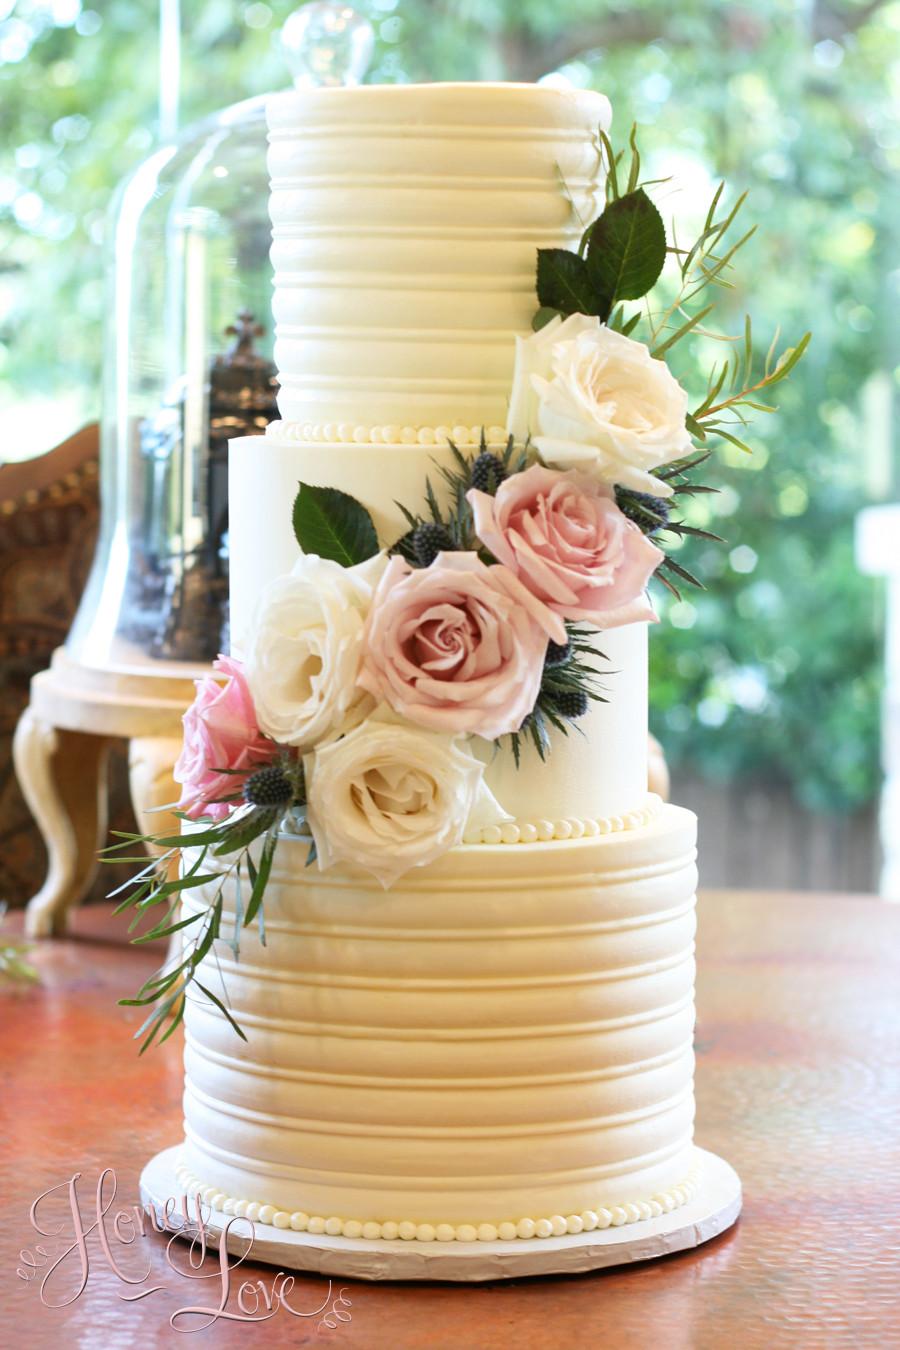 Buttercream Wedding Cakes  Wedding Cakes — HoneyLove Cakery